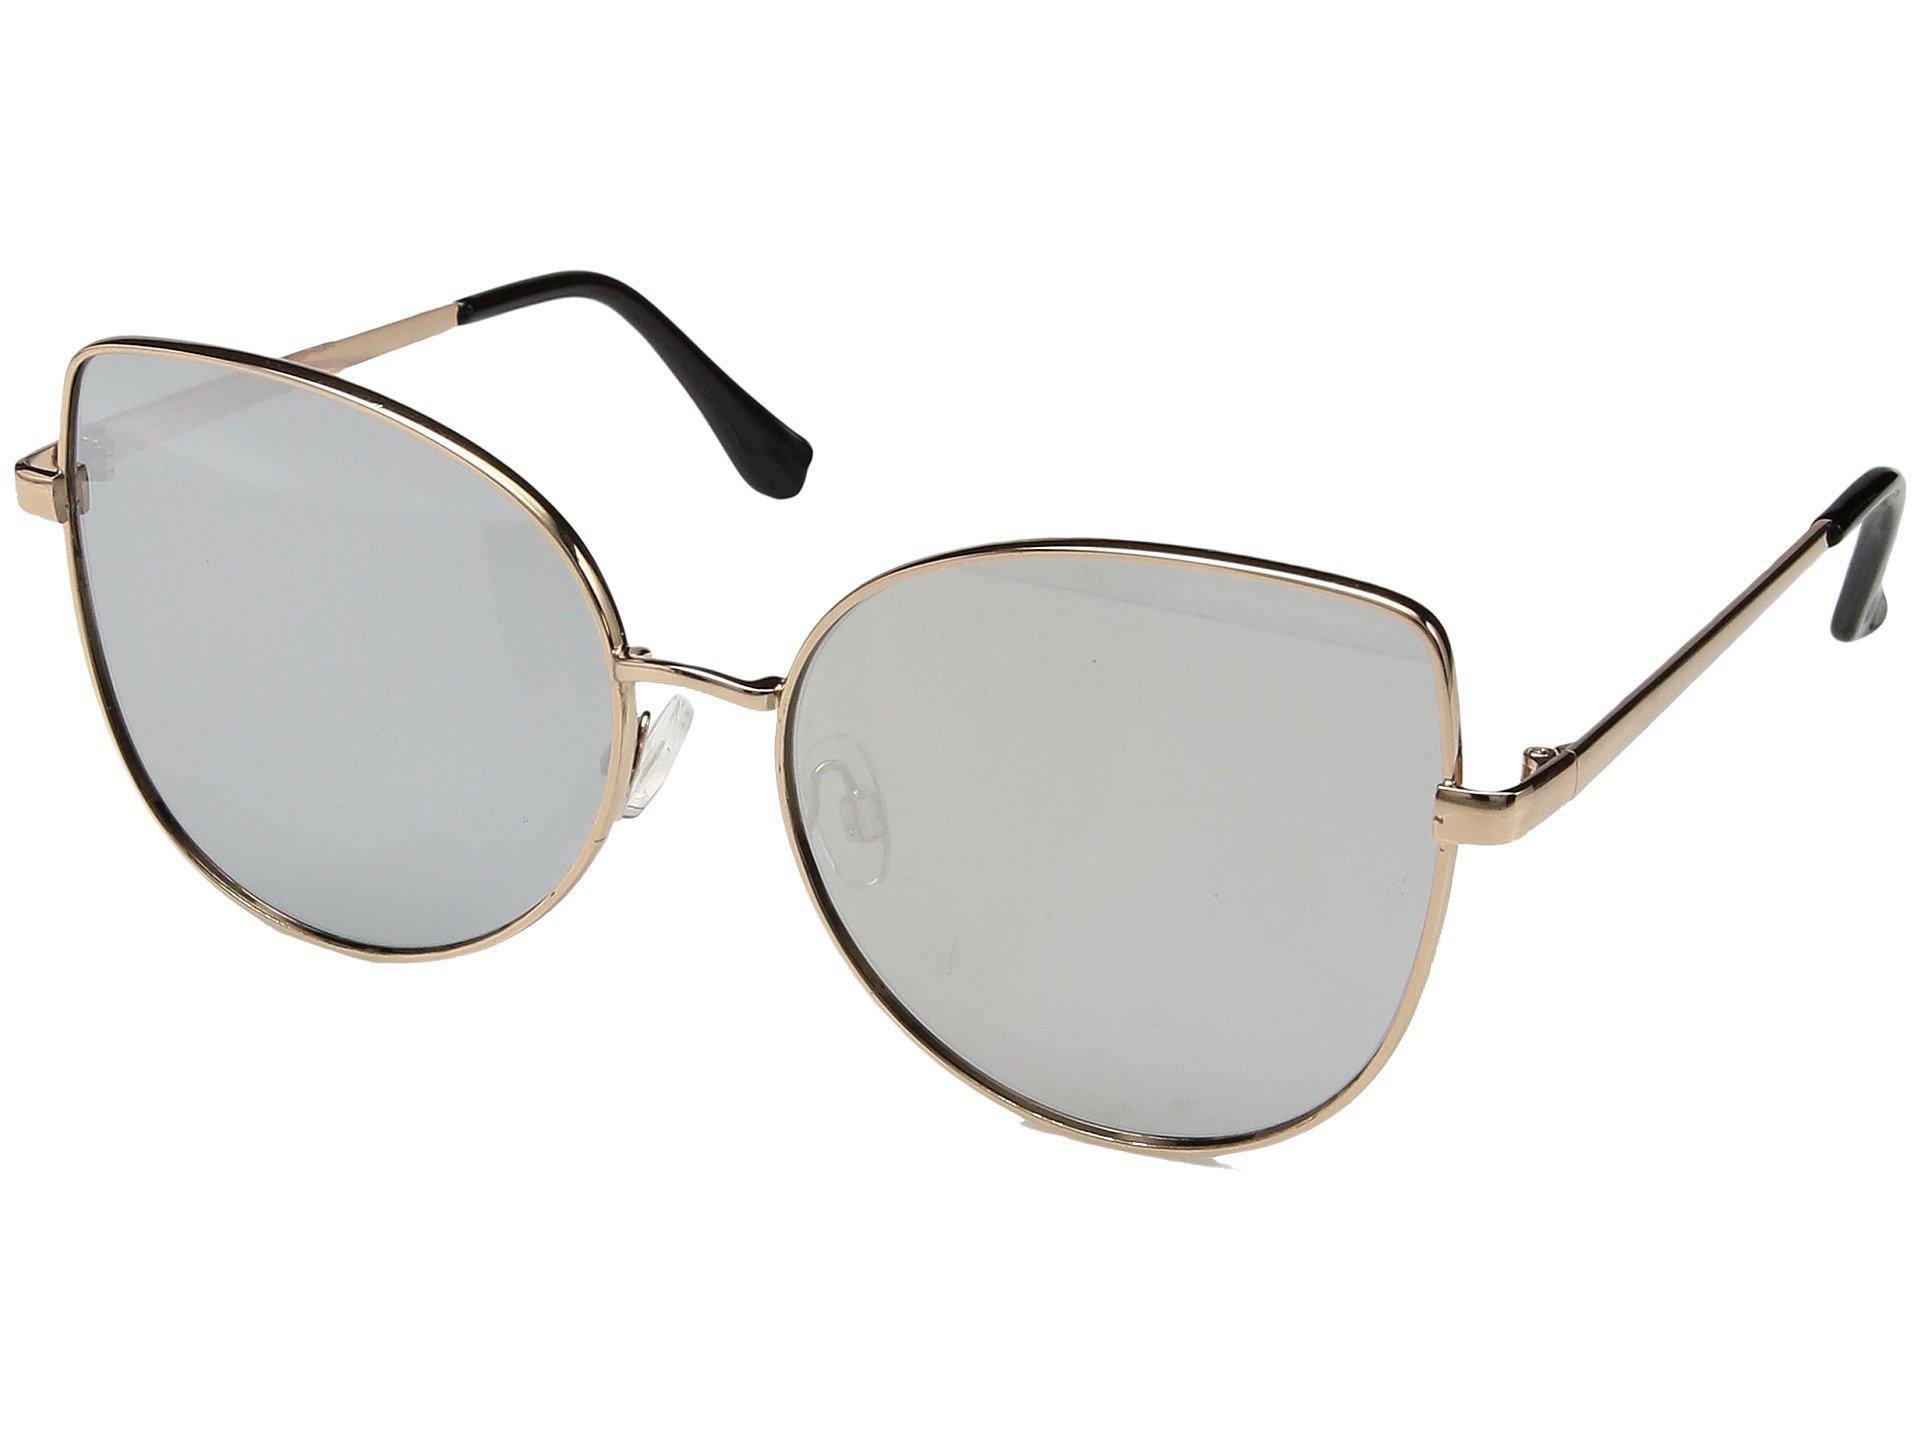 Lyst - San Diego Hat Company Metal Frame Cat Eyes Sunglasses in Metallic